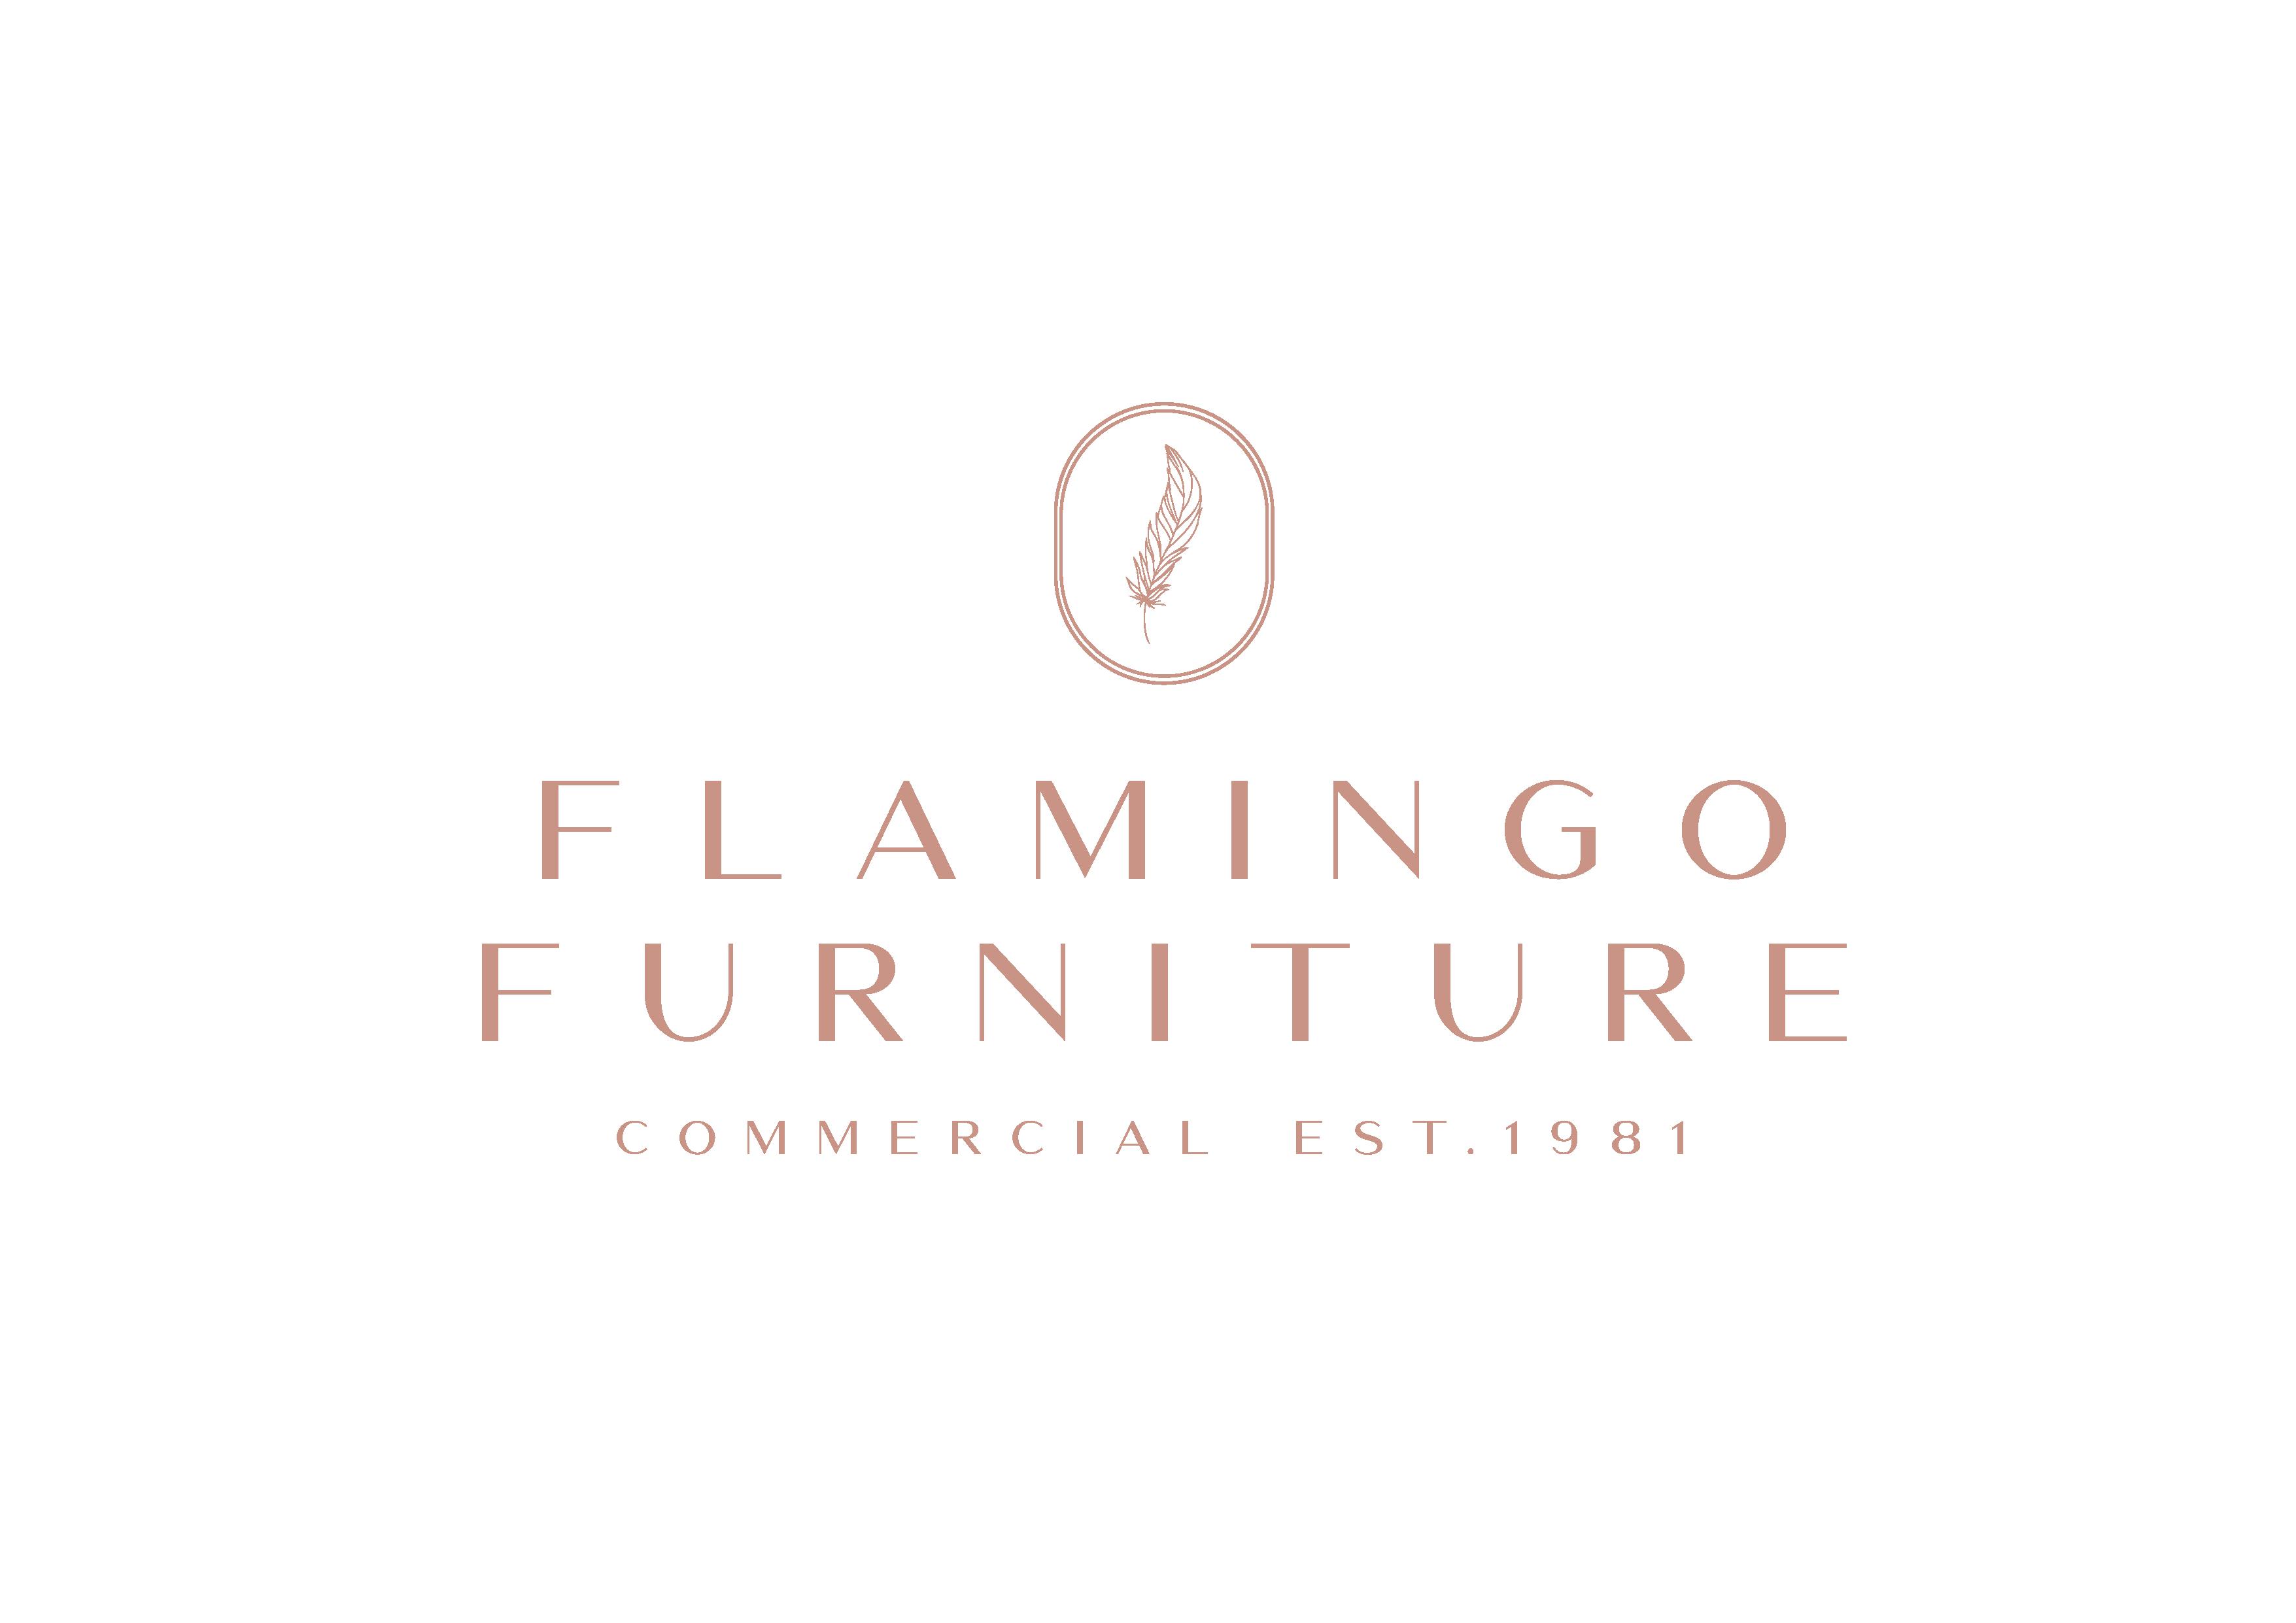 Flamingo Furniture Commercial Division